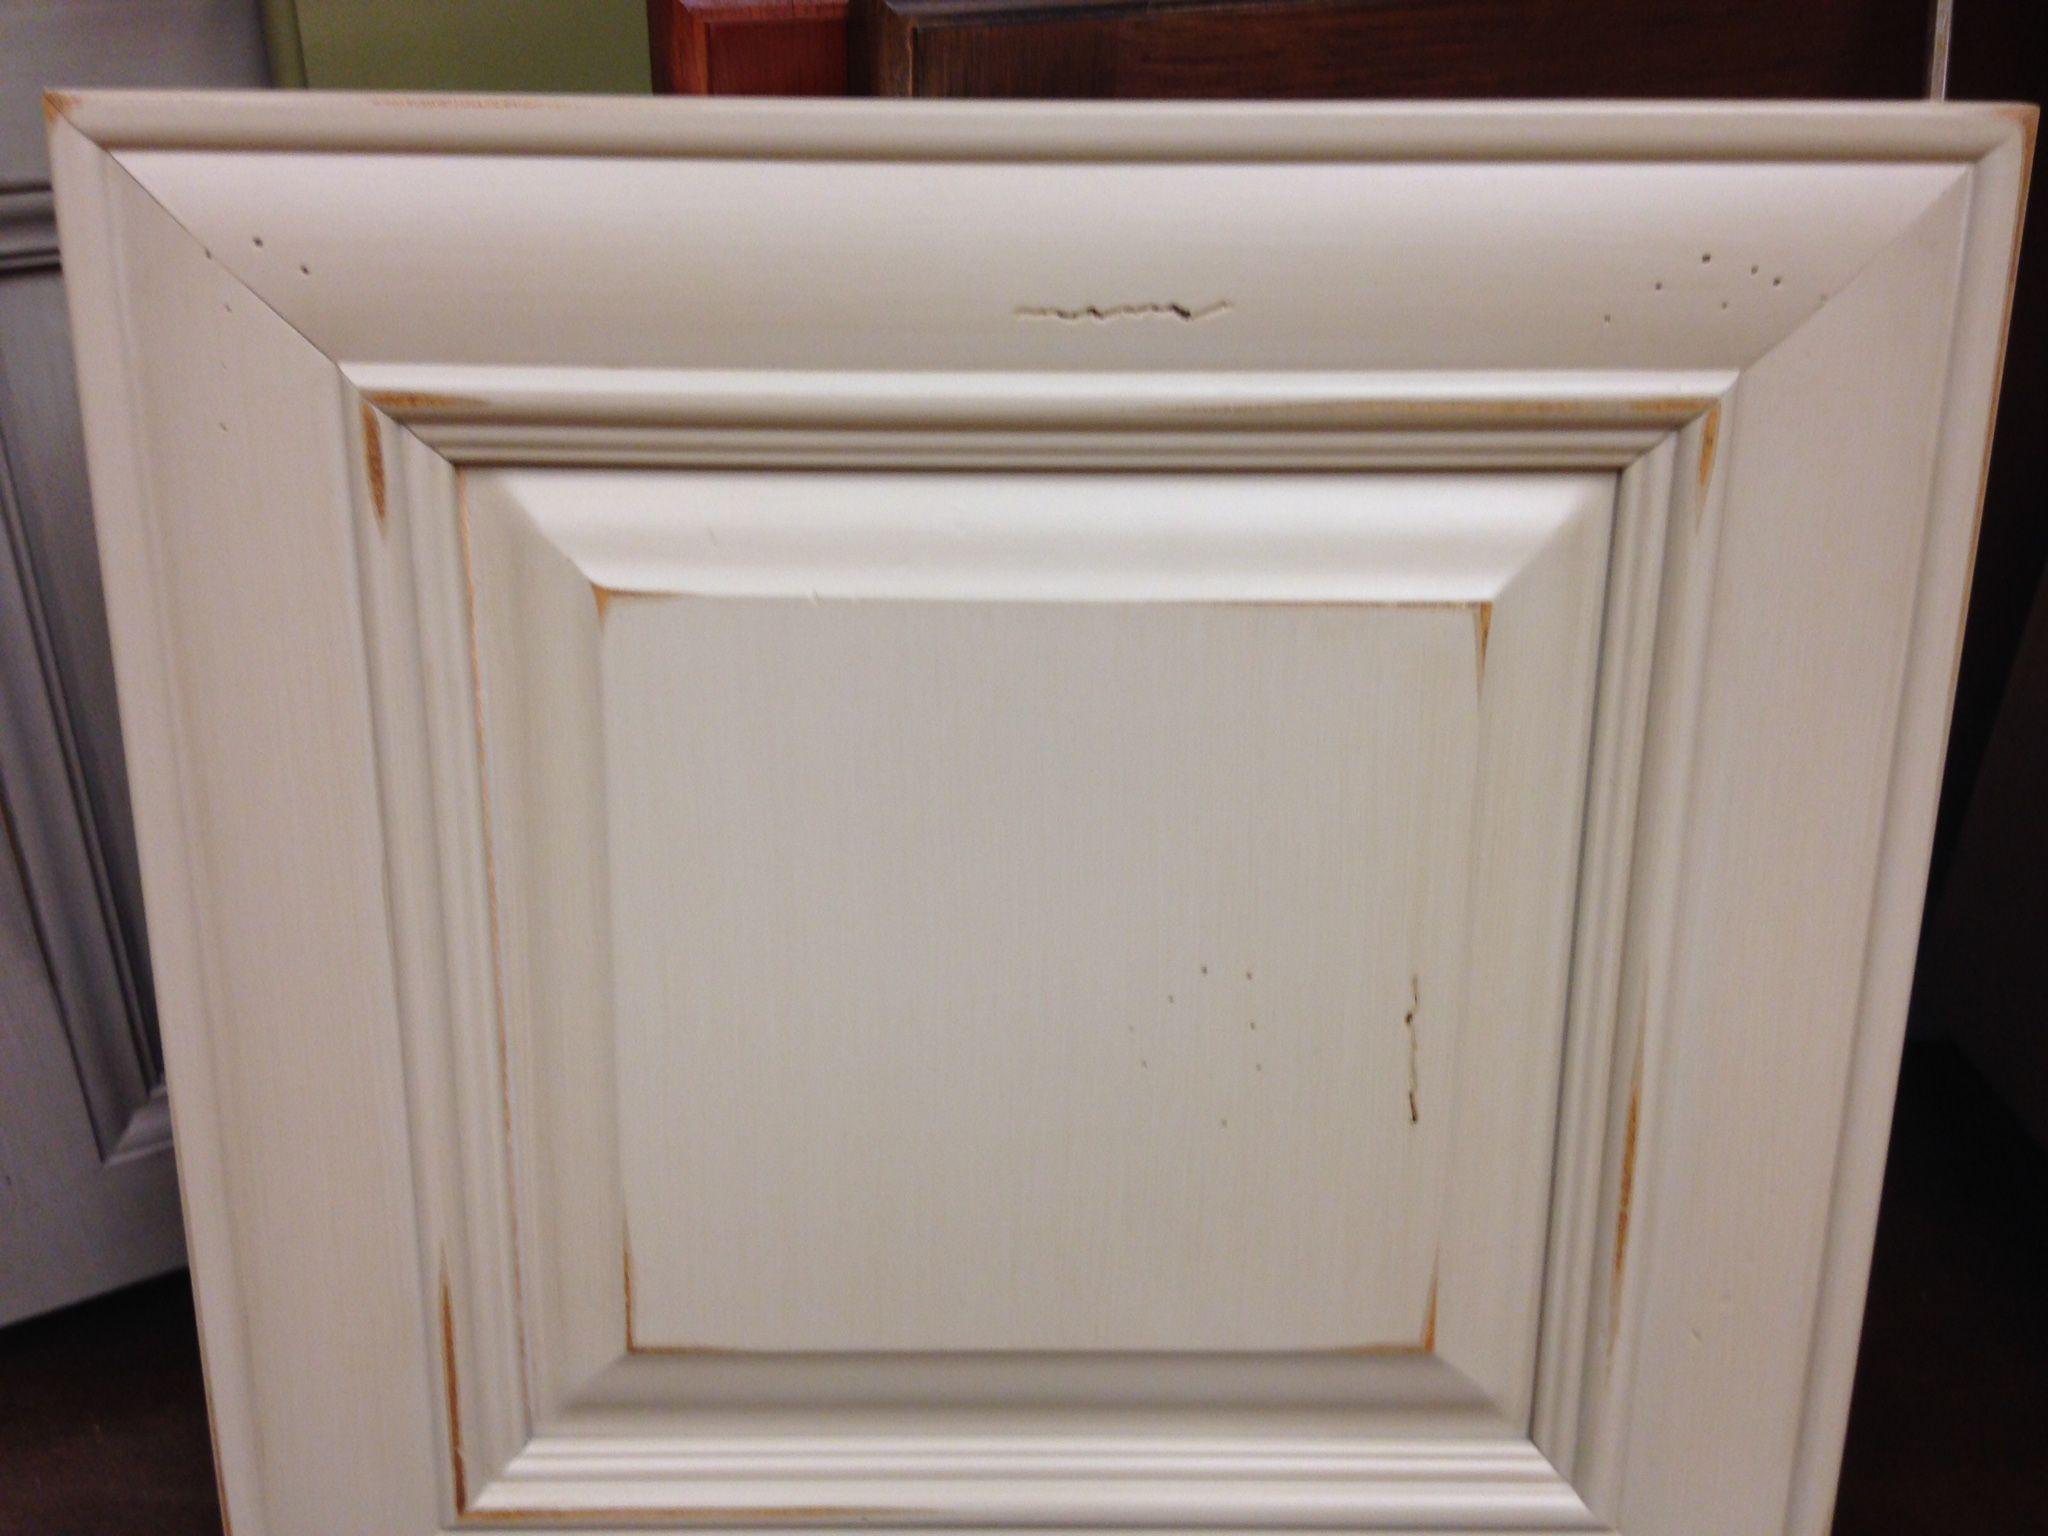 Eudora Kith Harford Maple Heirloom Willow Gray Home Decor Decor Furniture